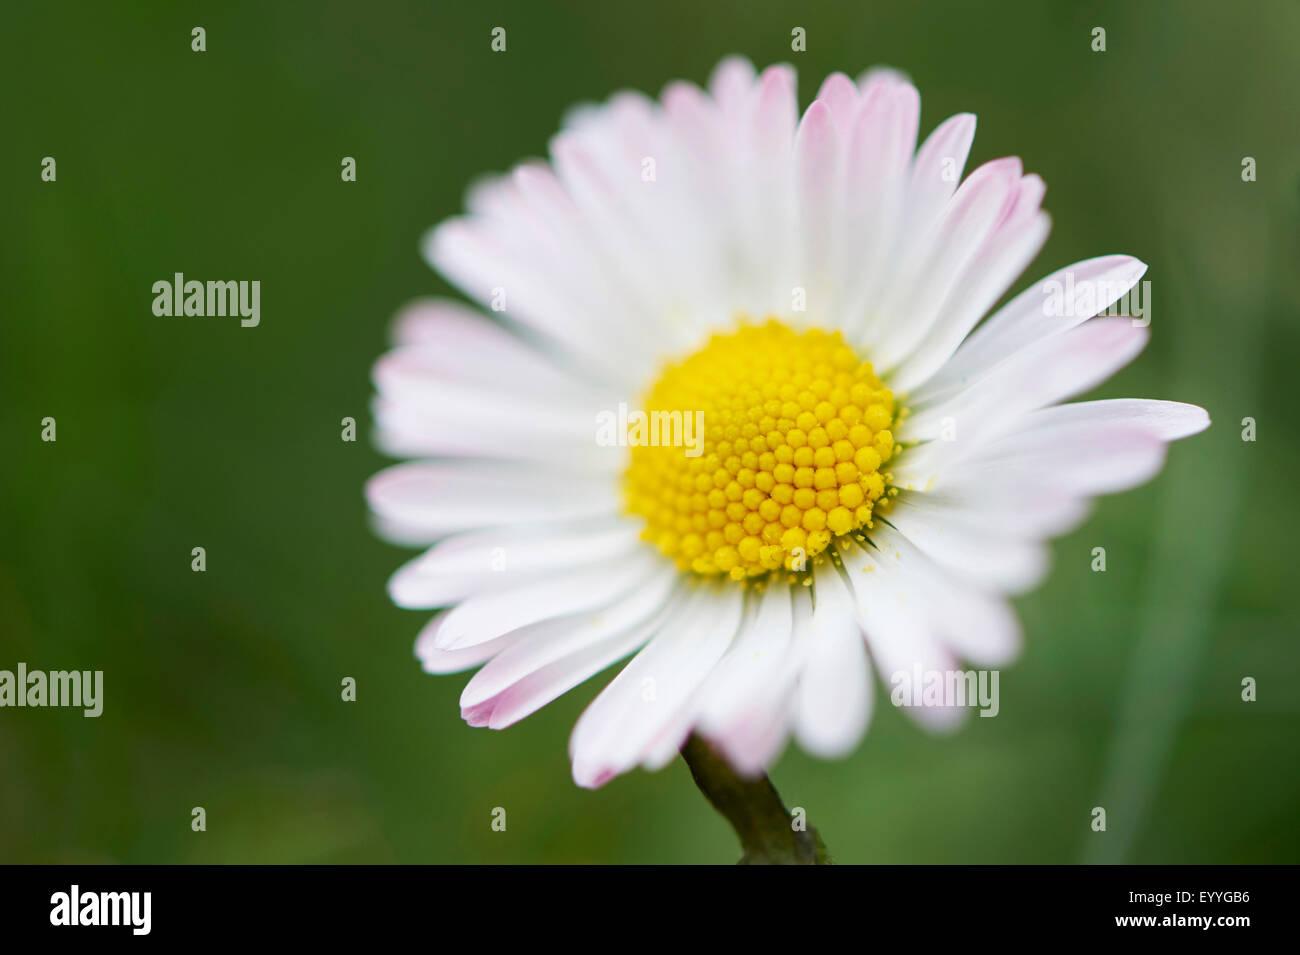 common daisy, lawn daisy, English daisy (Bellis perennis), flower, Germany, Bavaria, Oberpfalz Stock Photo